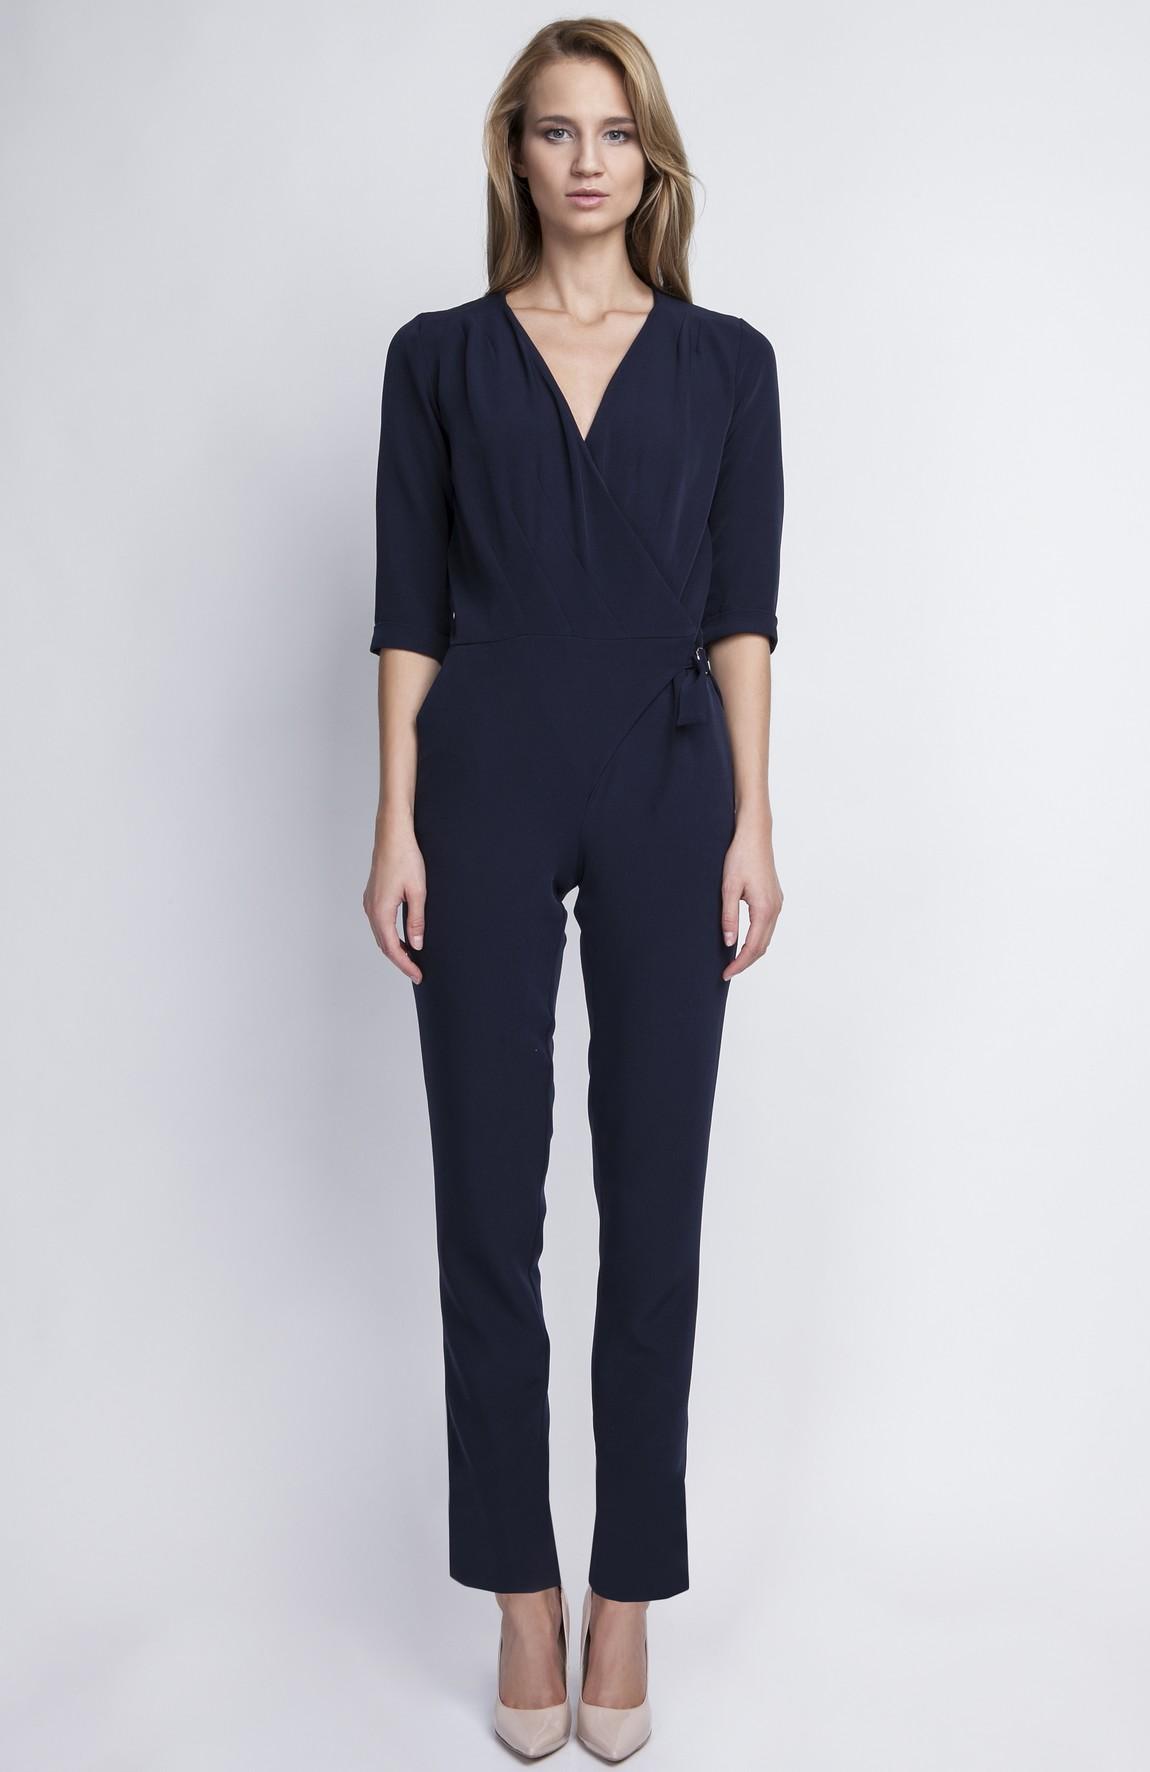 combinaison pantalon bleu marine lan 108 bl idresstocode. Black Bedroom Furniture Sets. Home Design Ideas